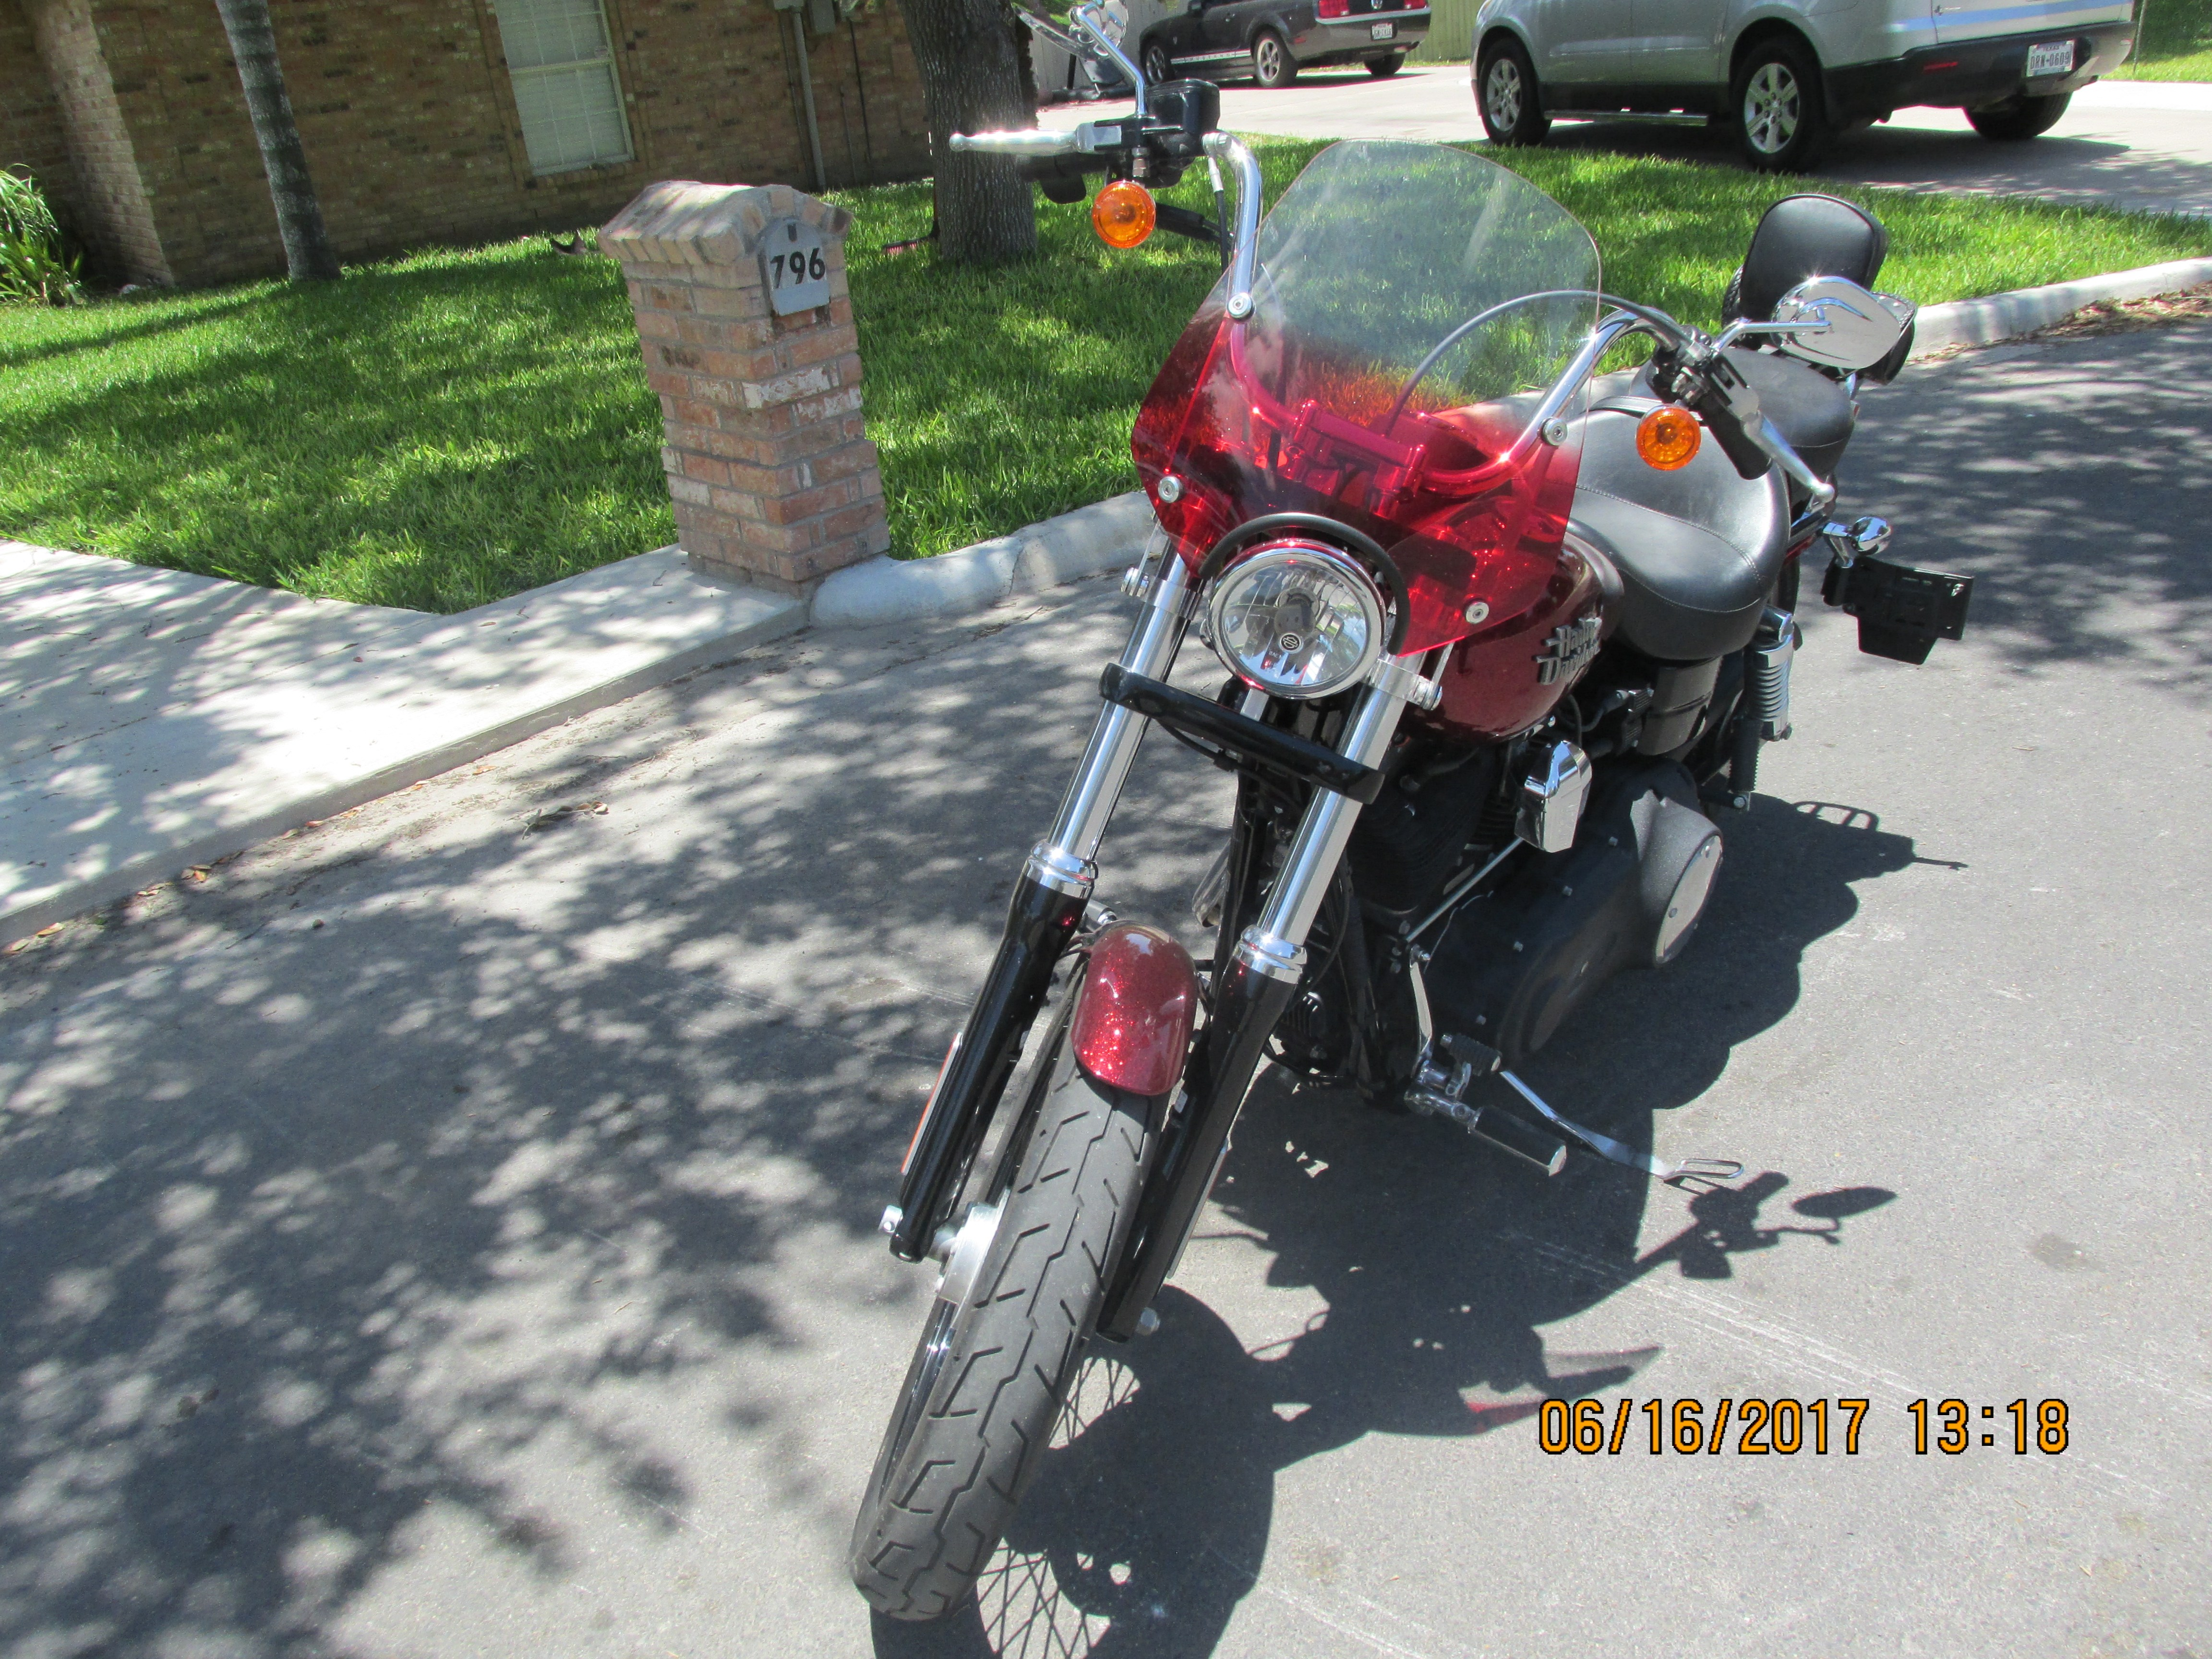 Harley Davidson Dyna Motorcycles For Sale San Marcos Tx >> Harley Davidson Dyna Motorcycles For Sale San Marcos Tx 2019 2020